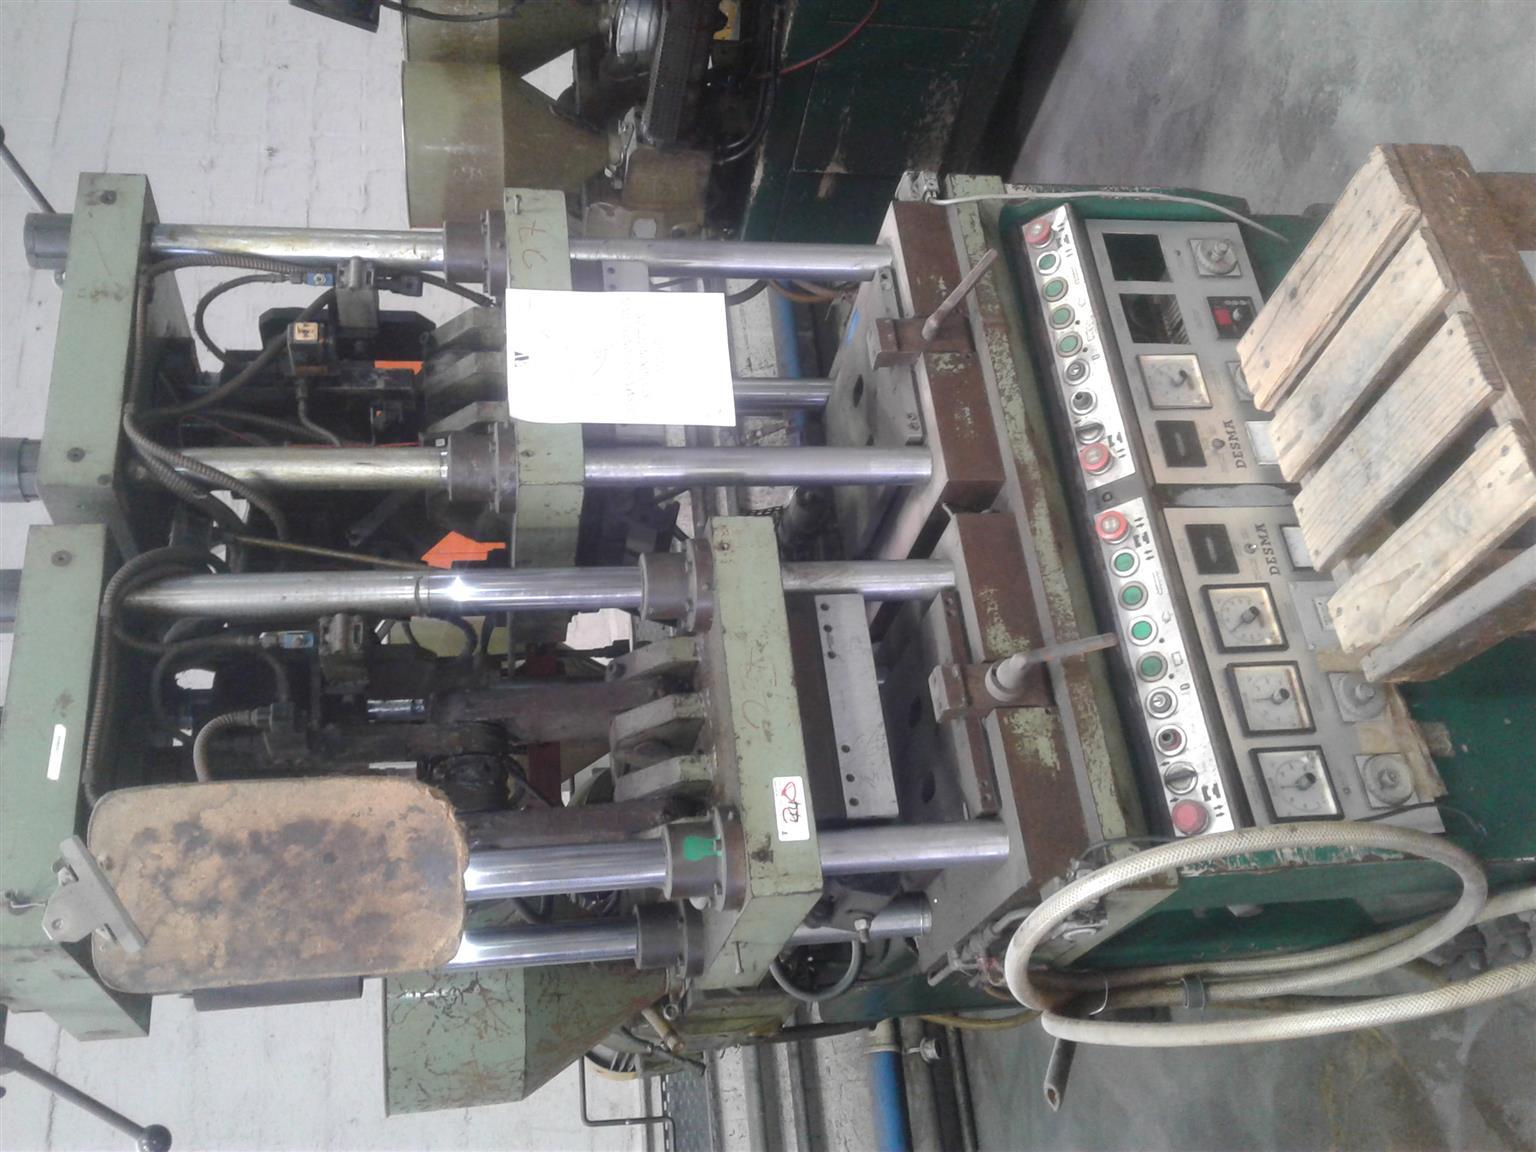 Desma Horizontal Twin Station Injection Molder for sale